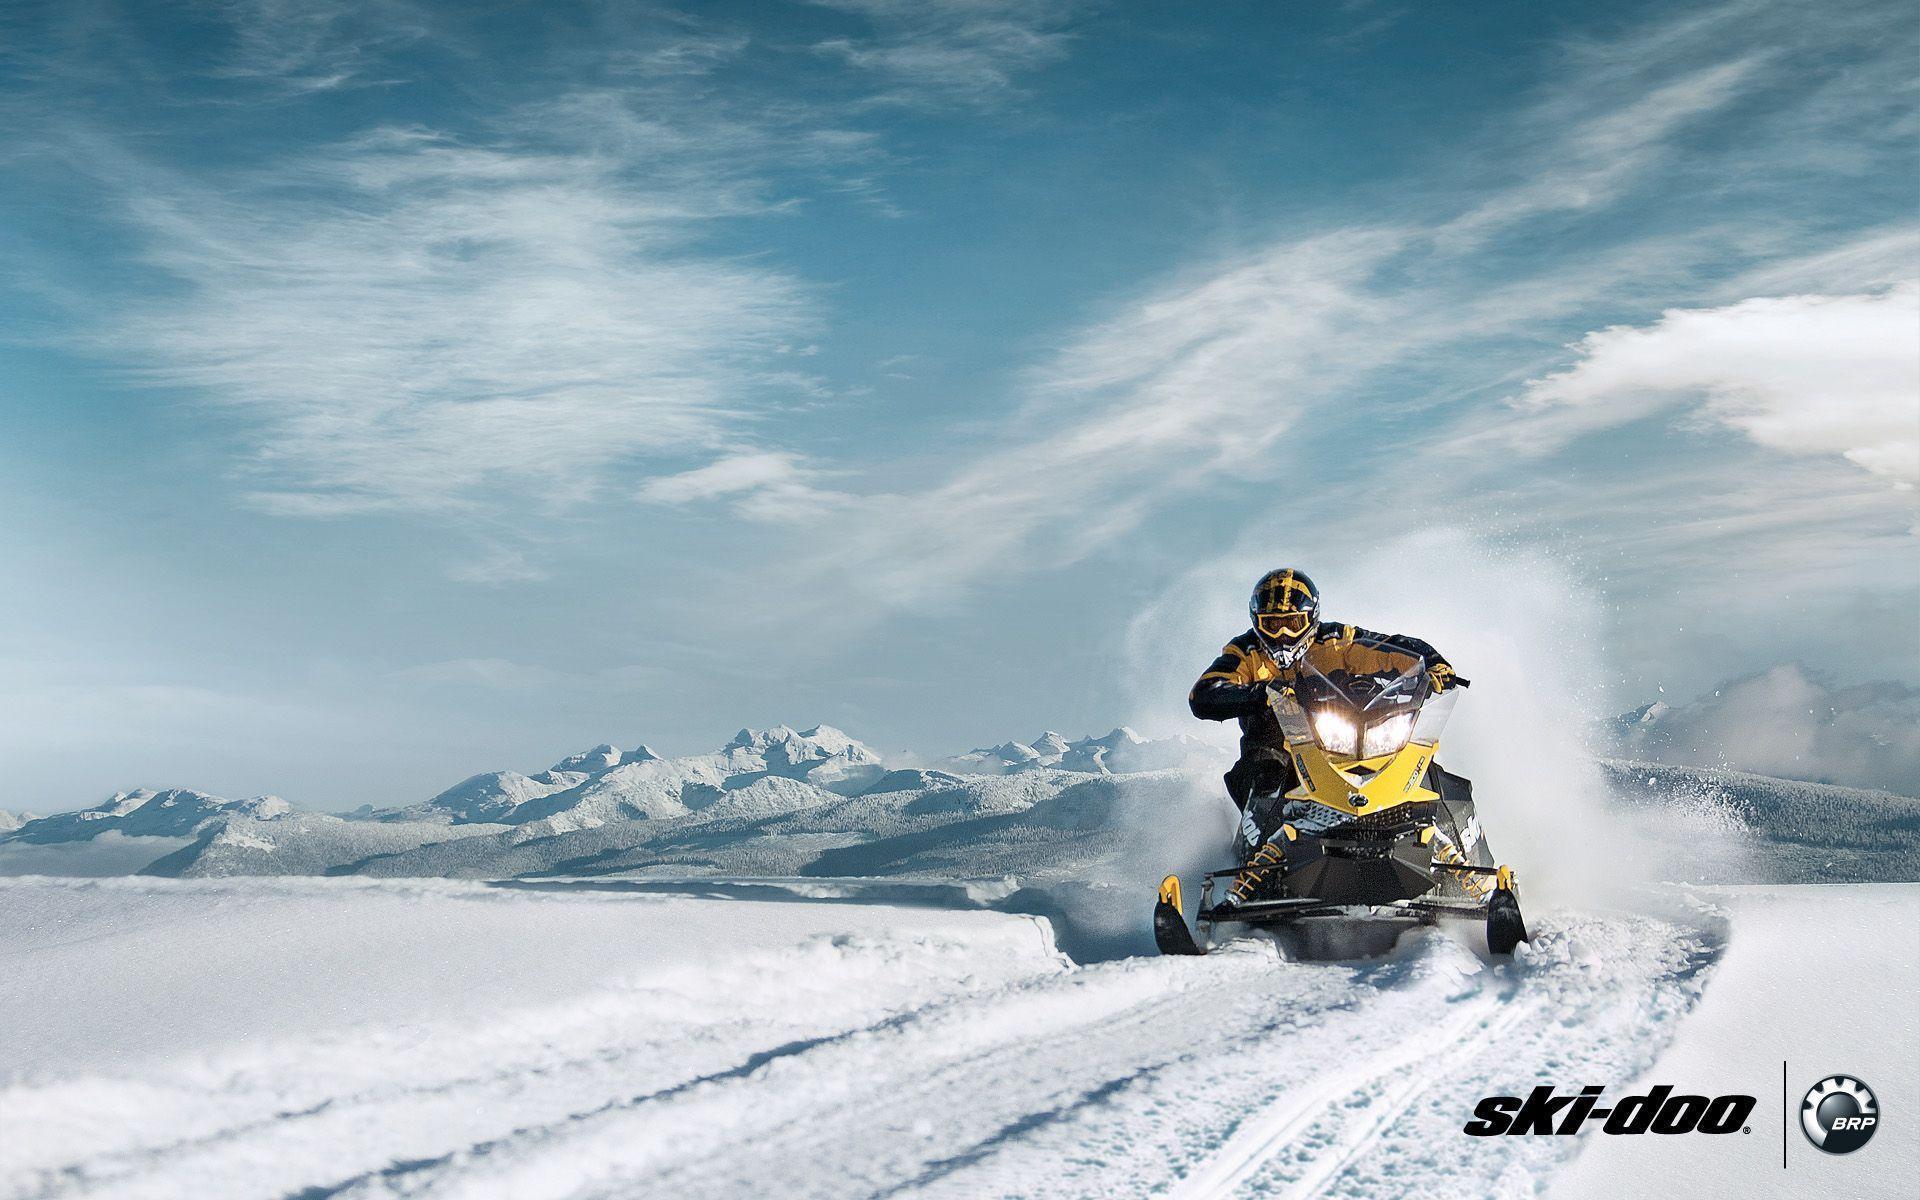 Ski Doo Wallpapers 1920x1200